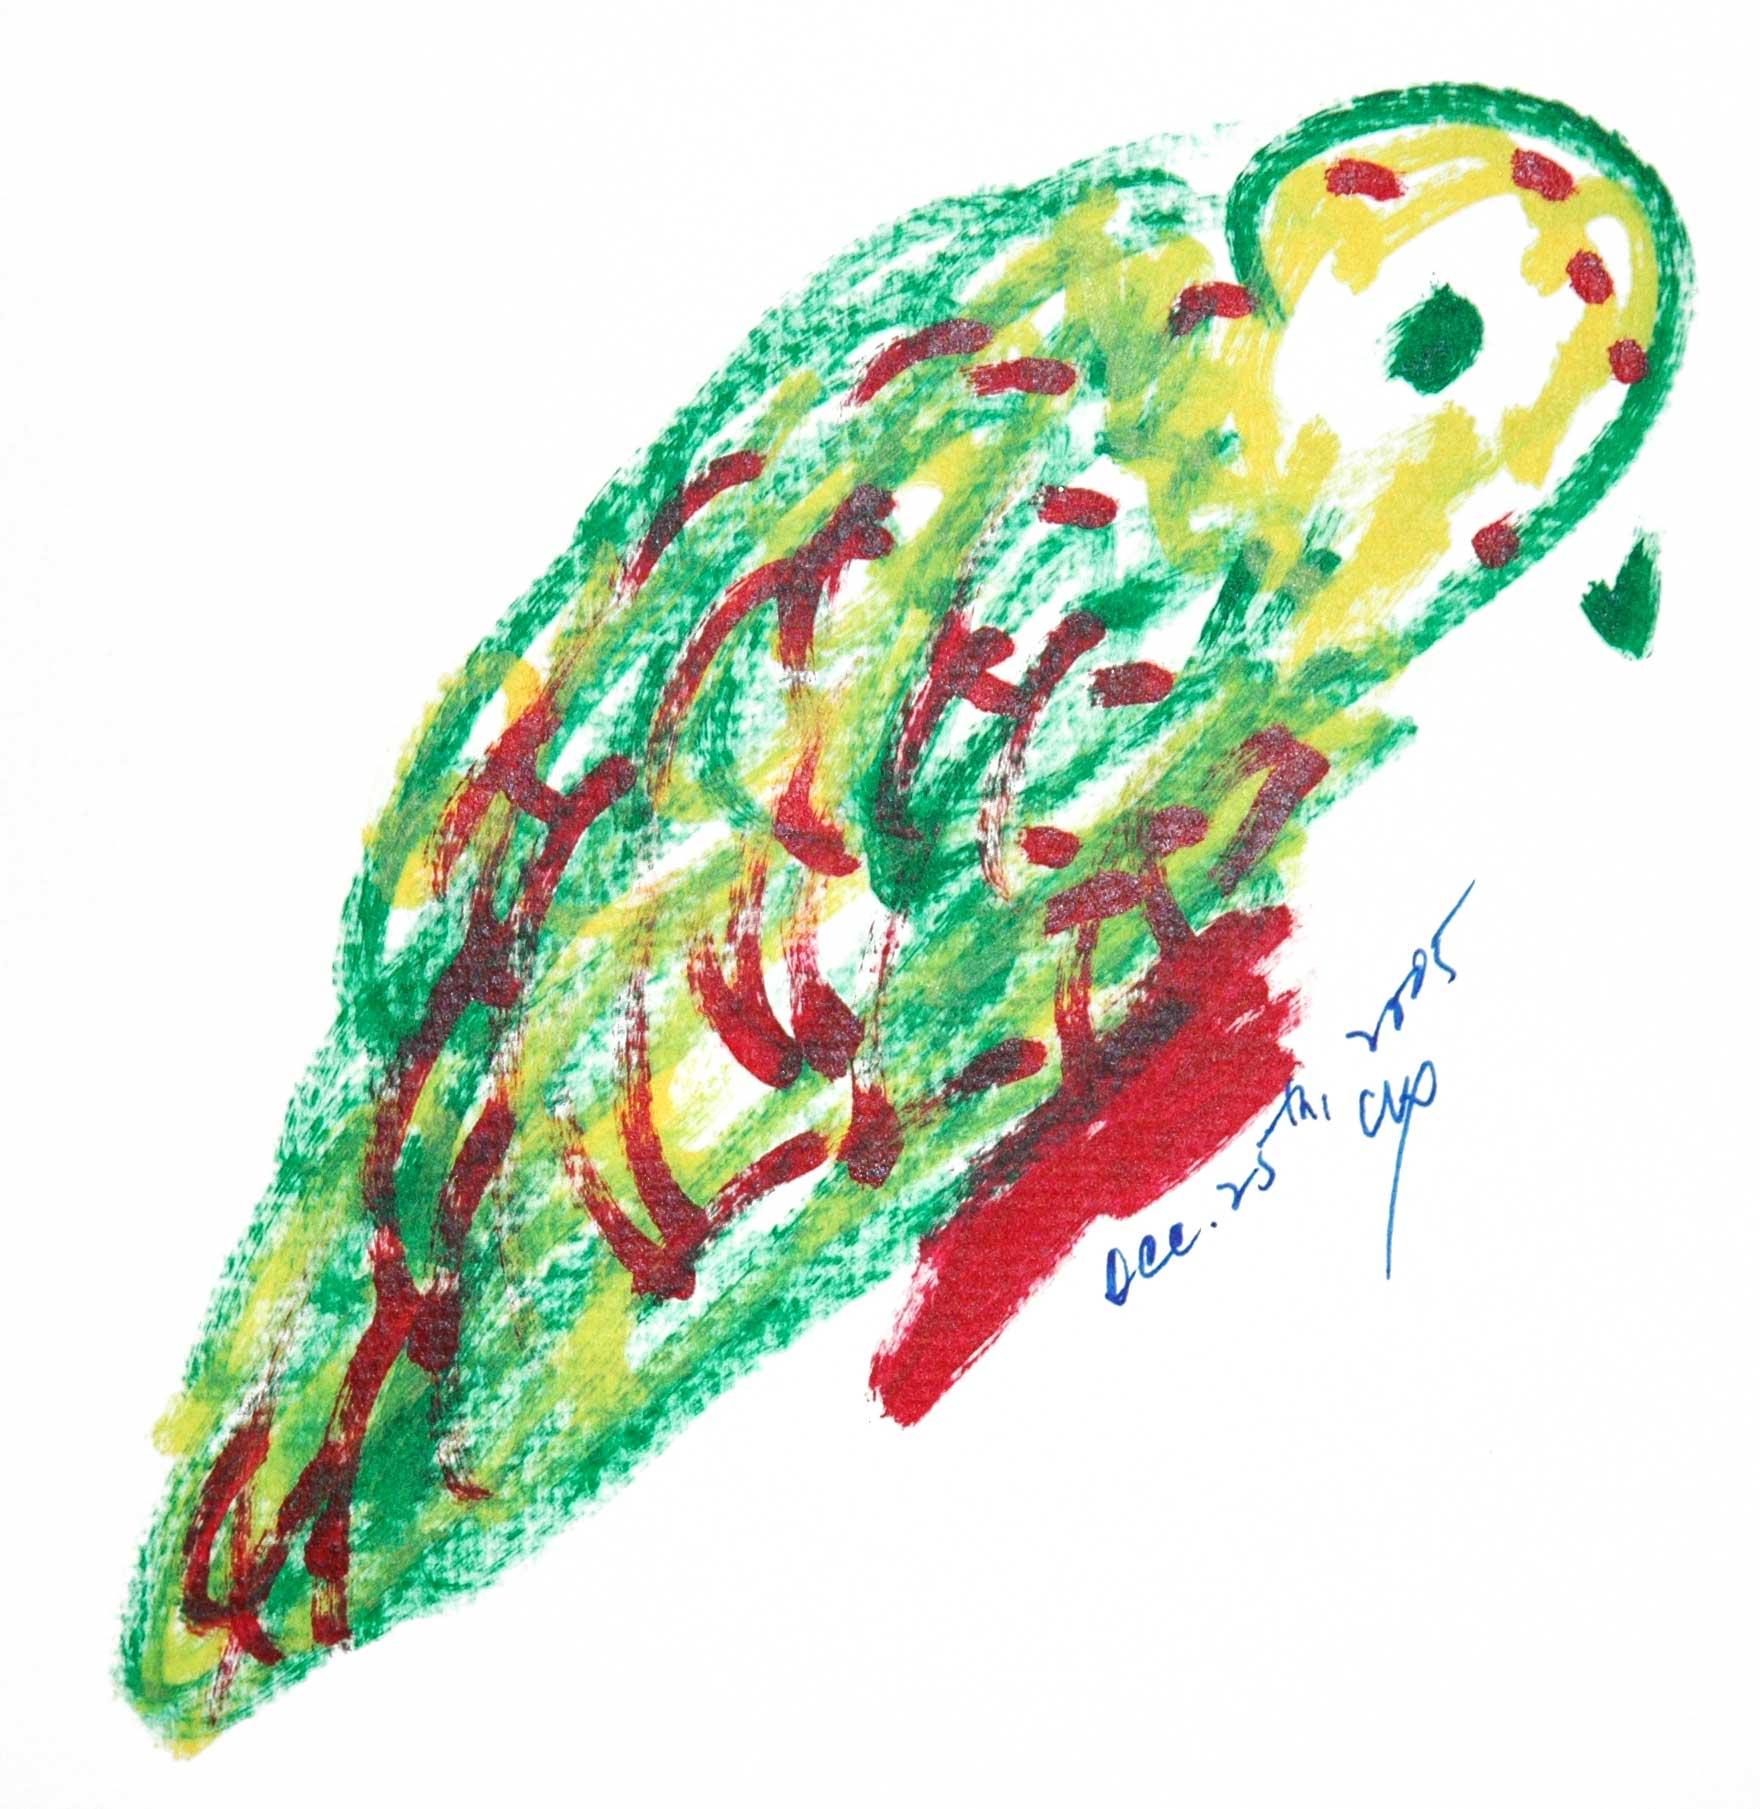 Bird-Drawing-by-Sri-Chinmoy-25-12-2005-7